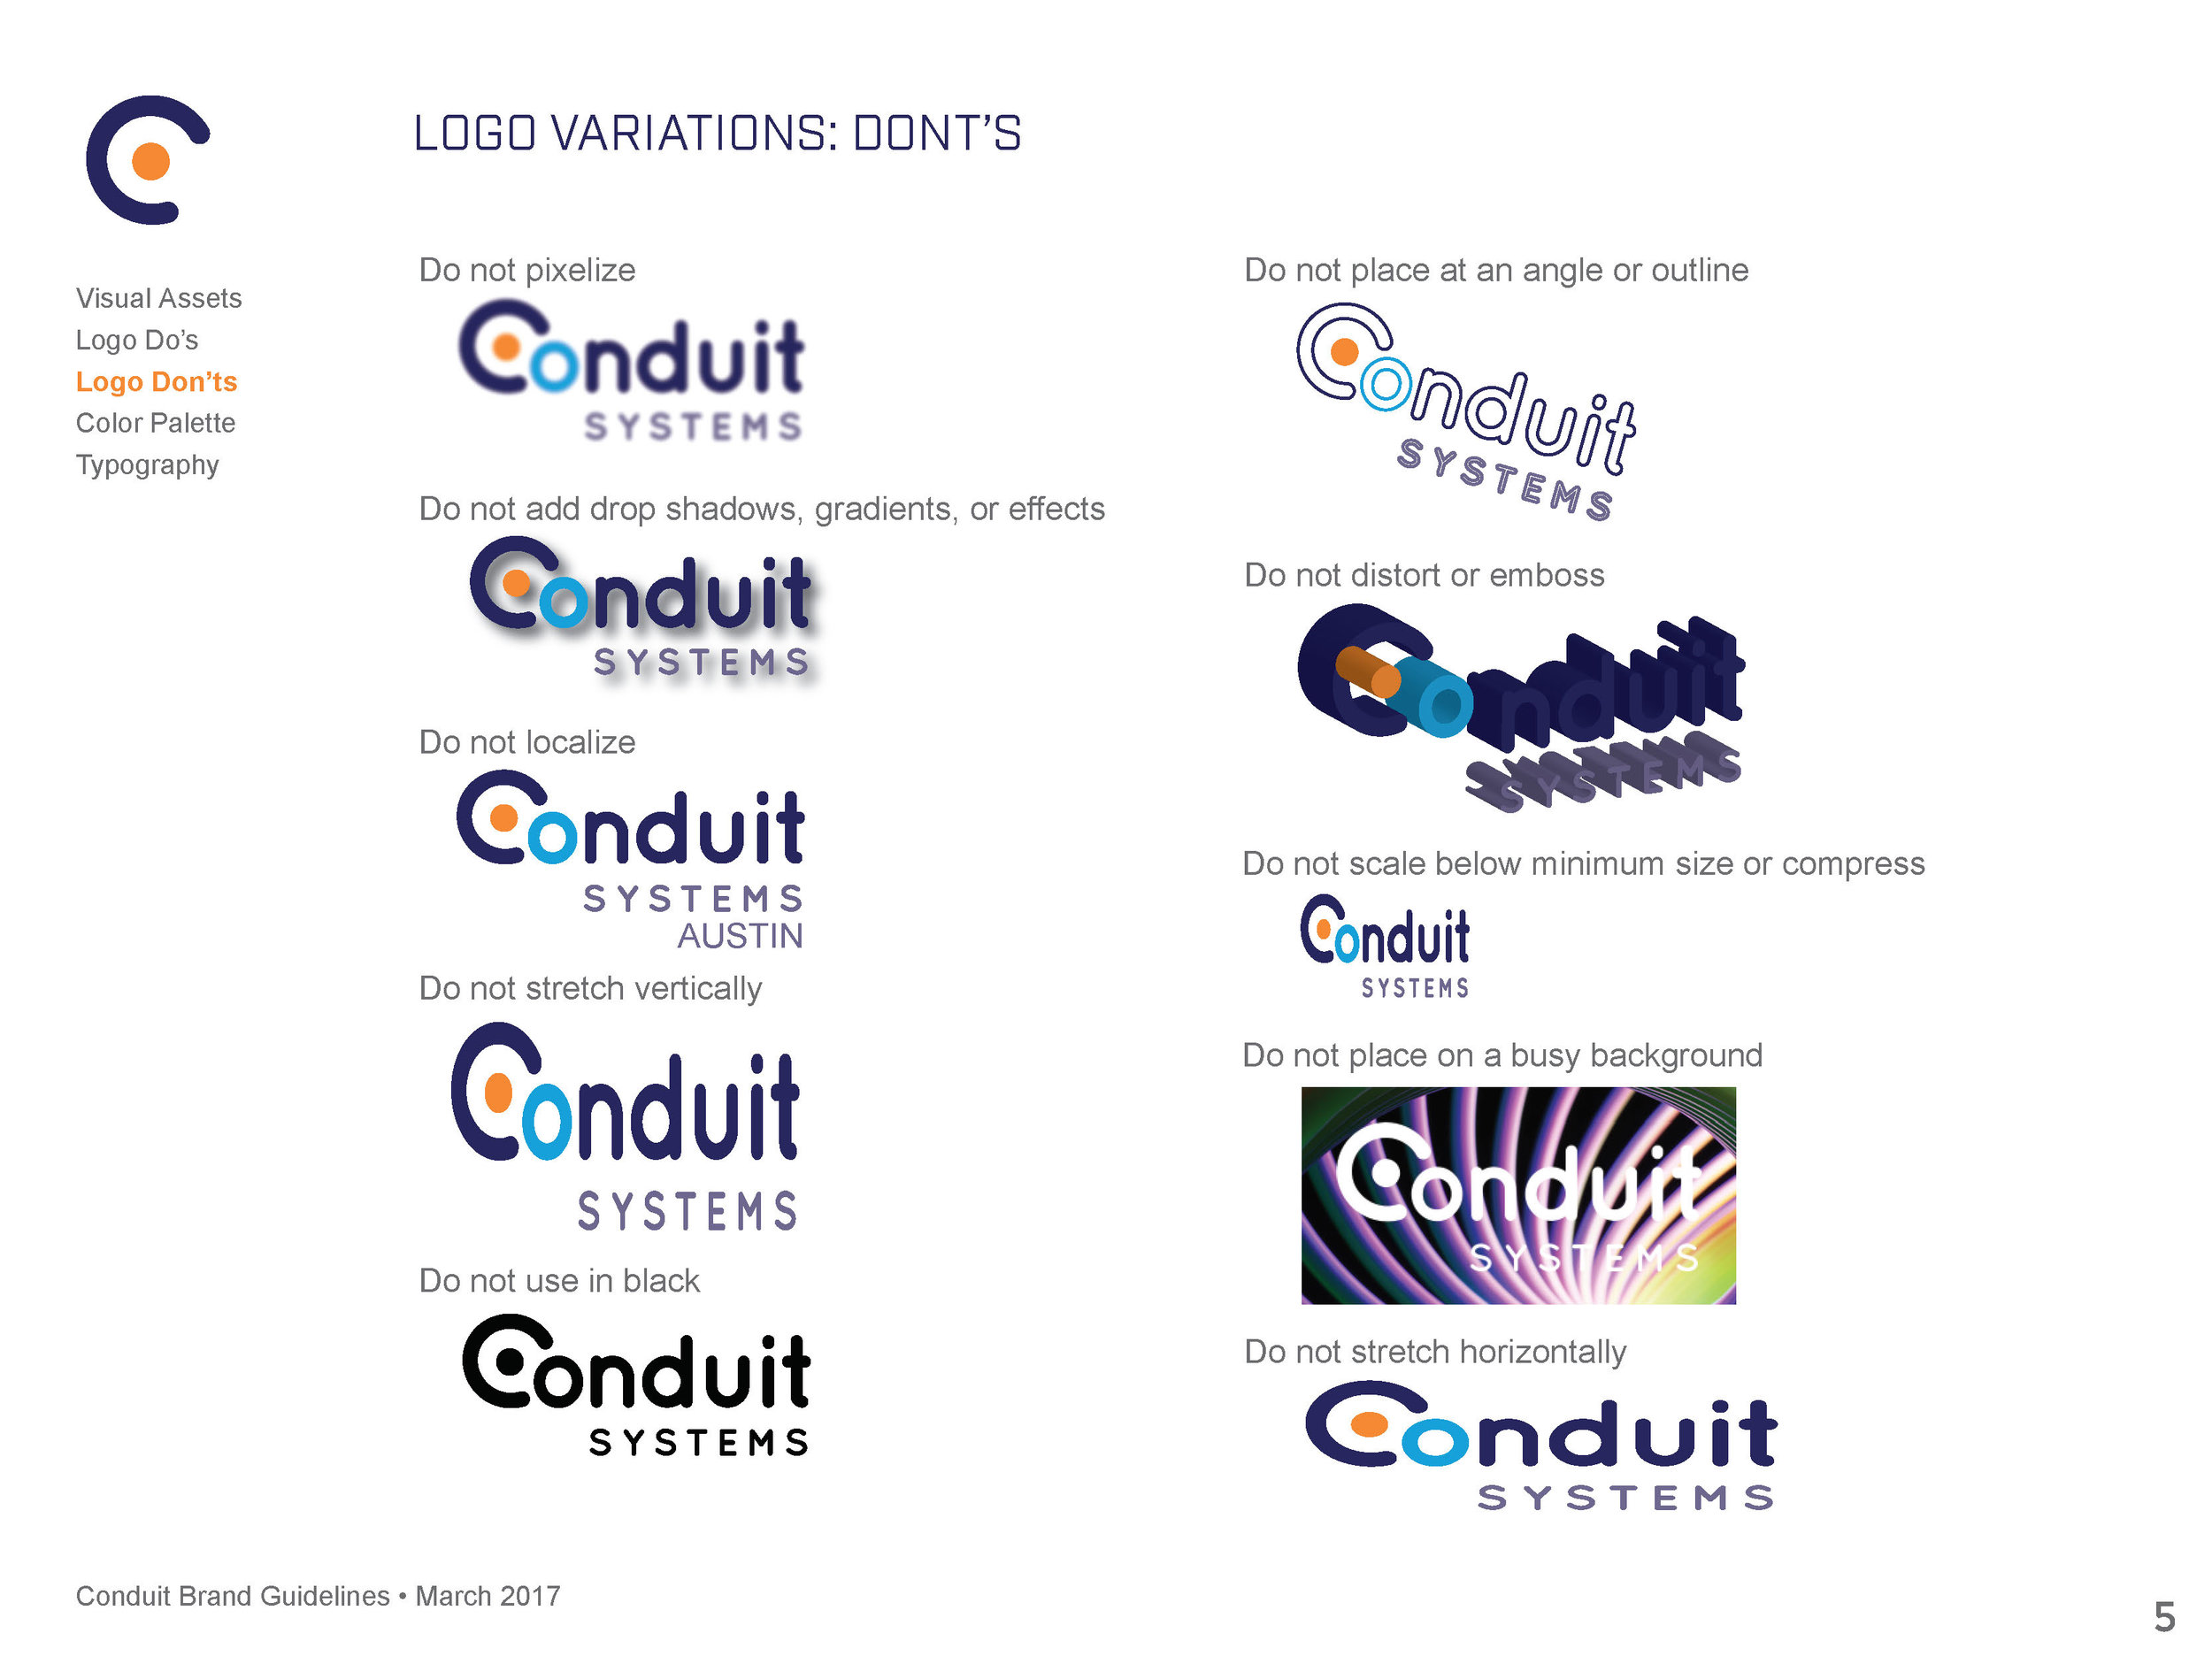 Conduit_BrandGuidelines_Page_5.jpg